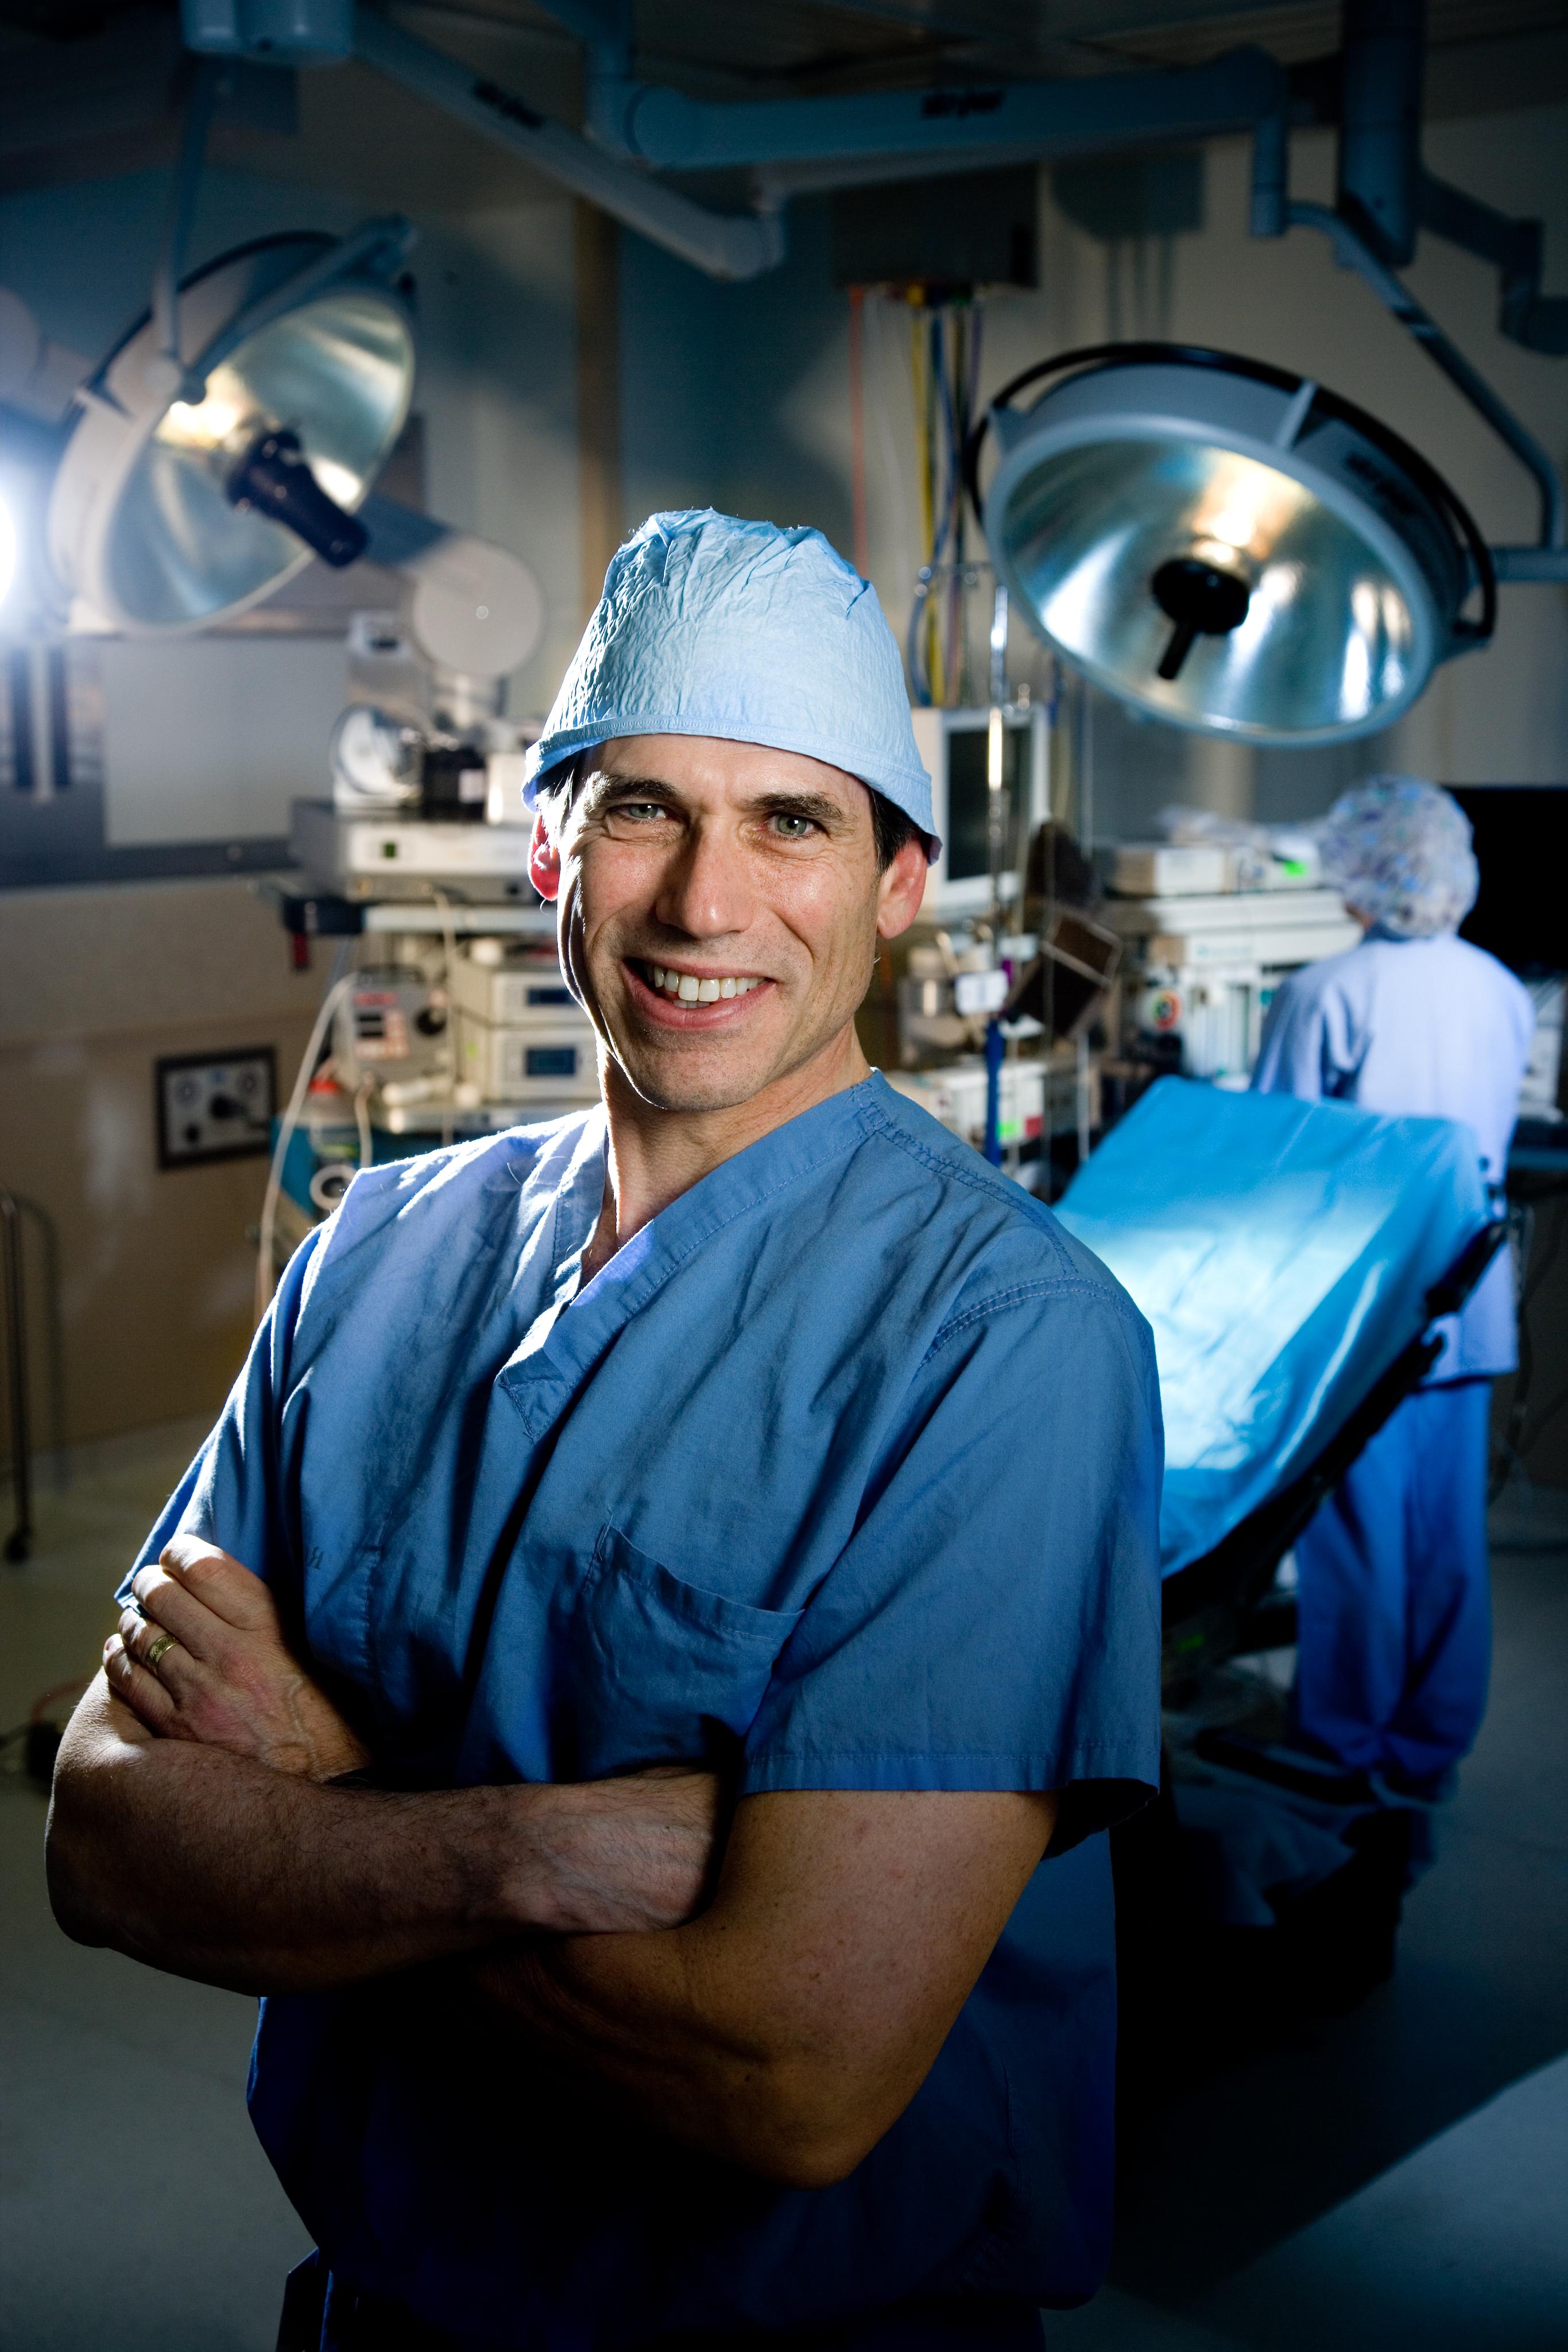 Dr. Philip Bobrow